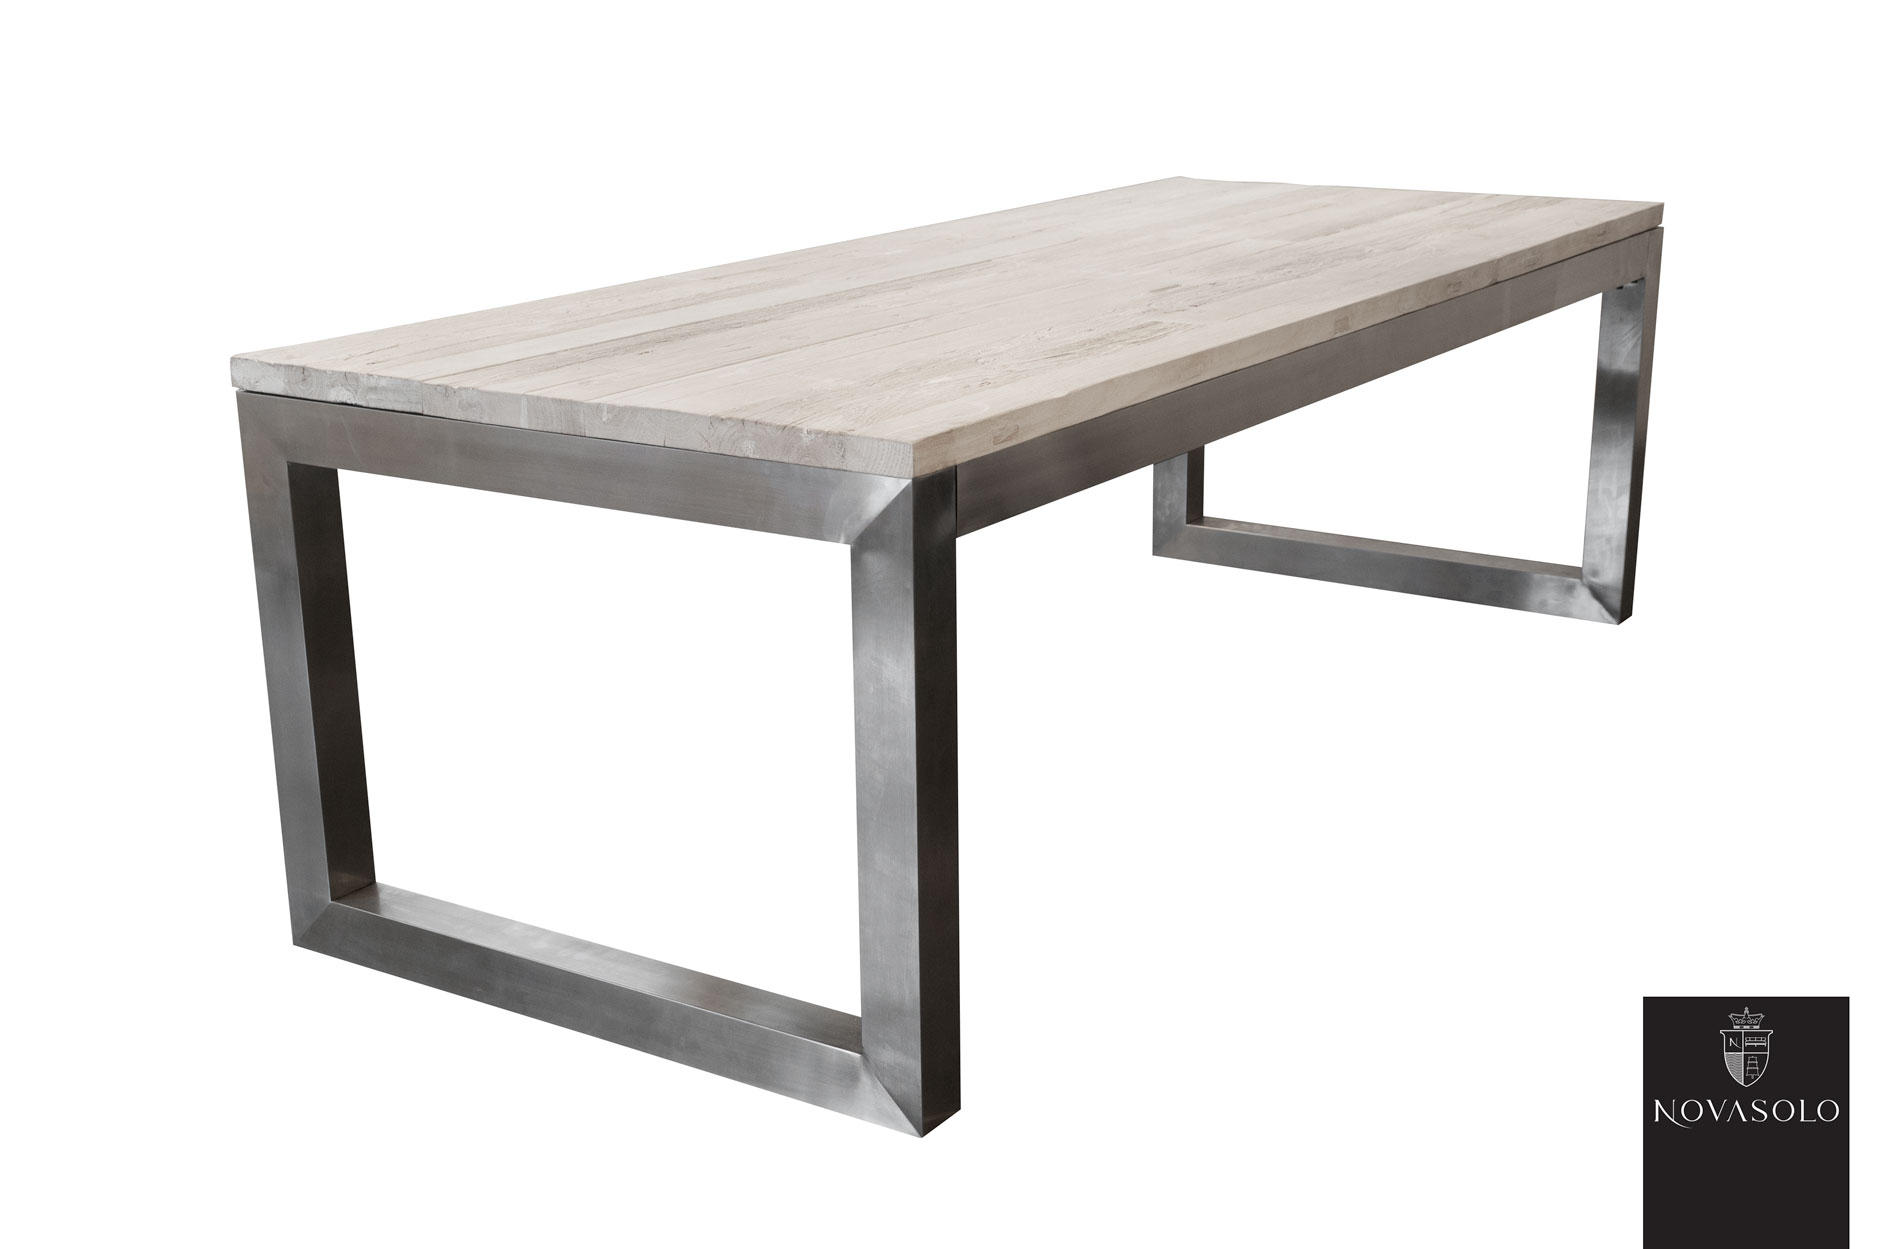 kvadratisk sofabord hvid